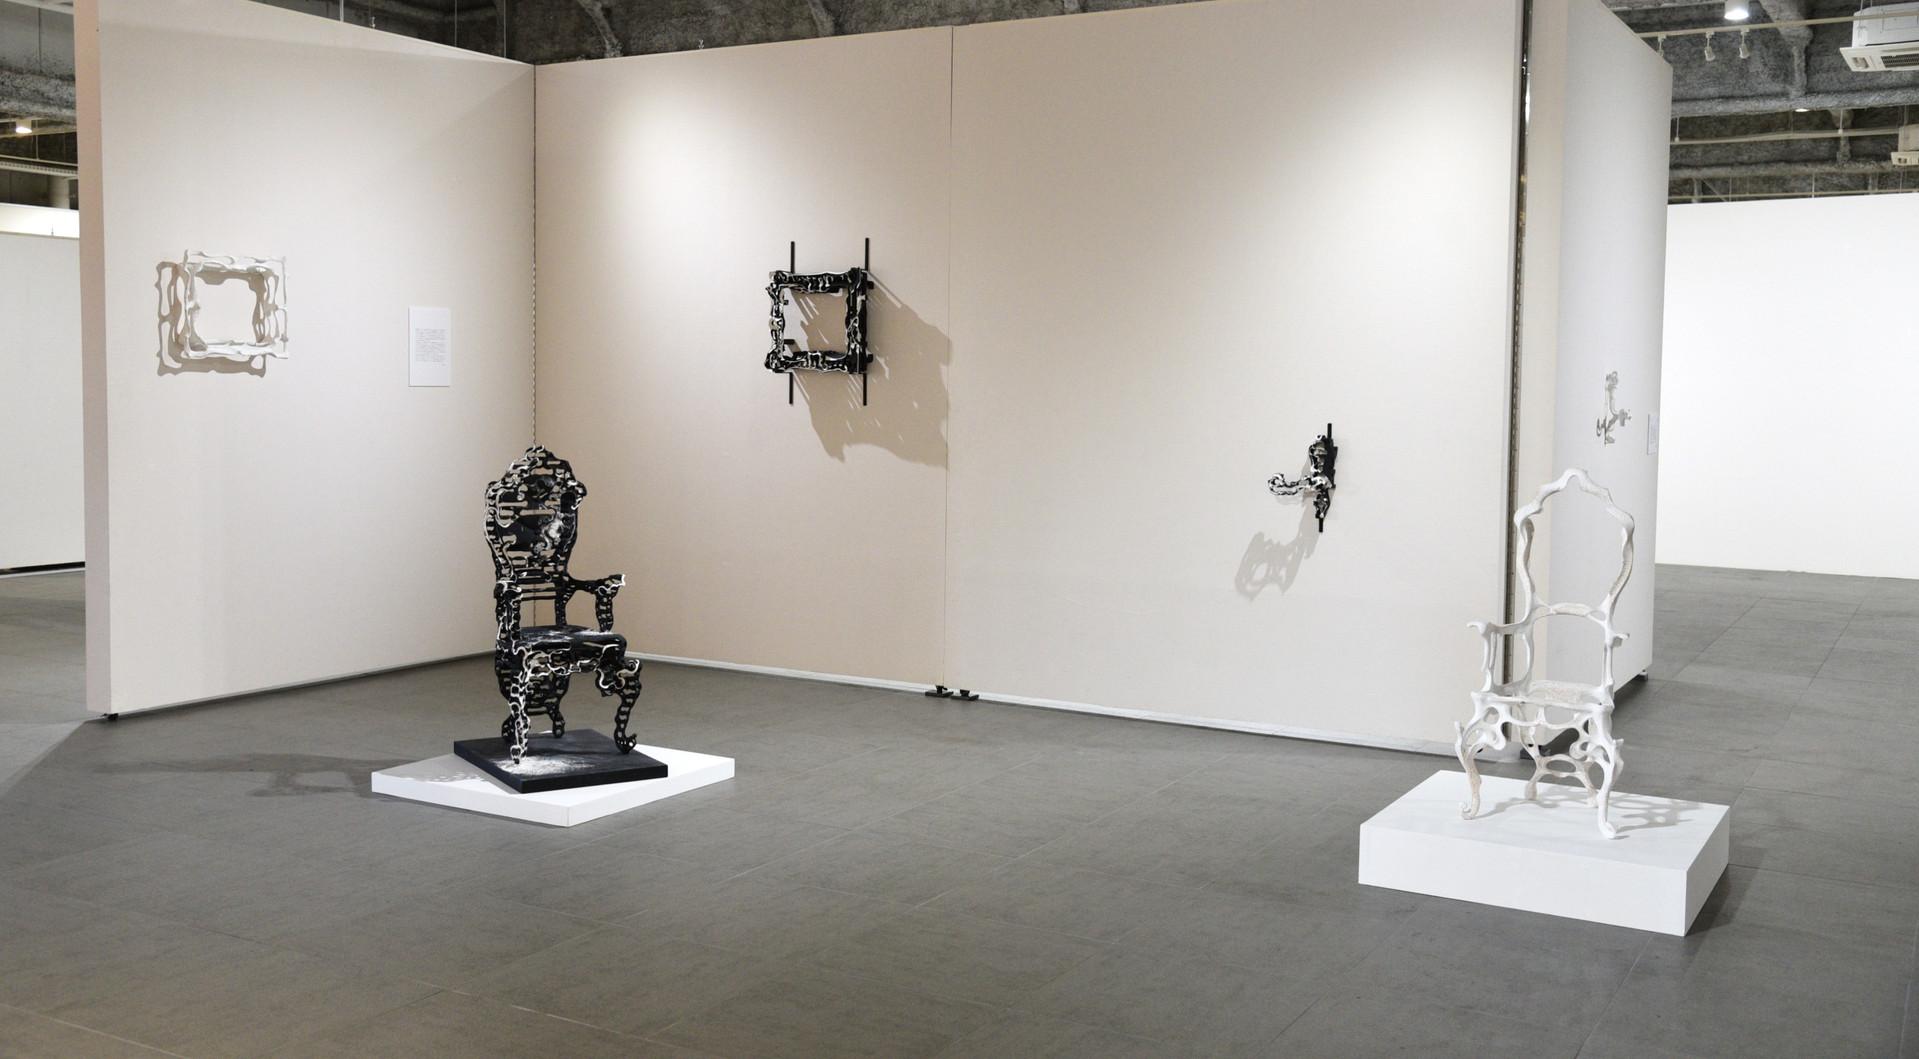 「OPEN STUDIO 2019」 exhibition